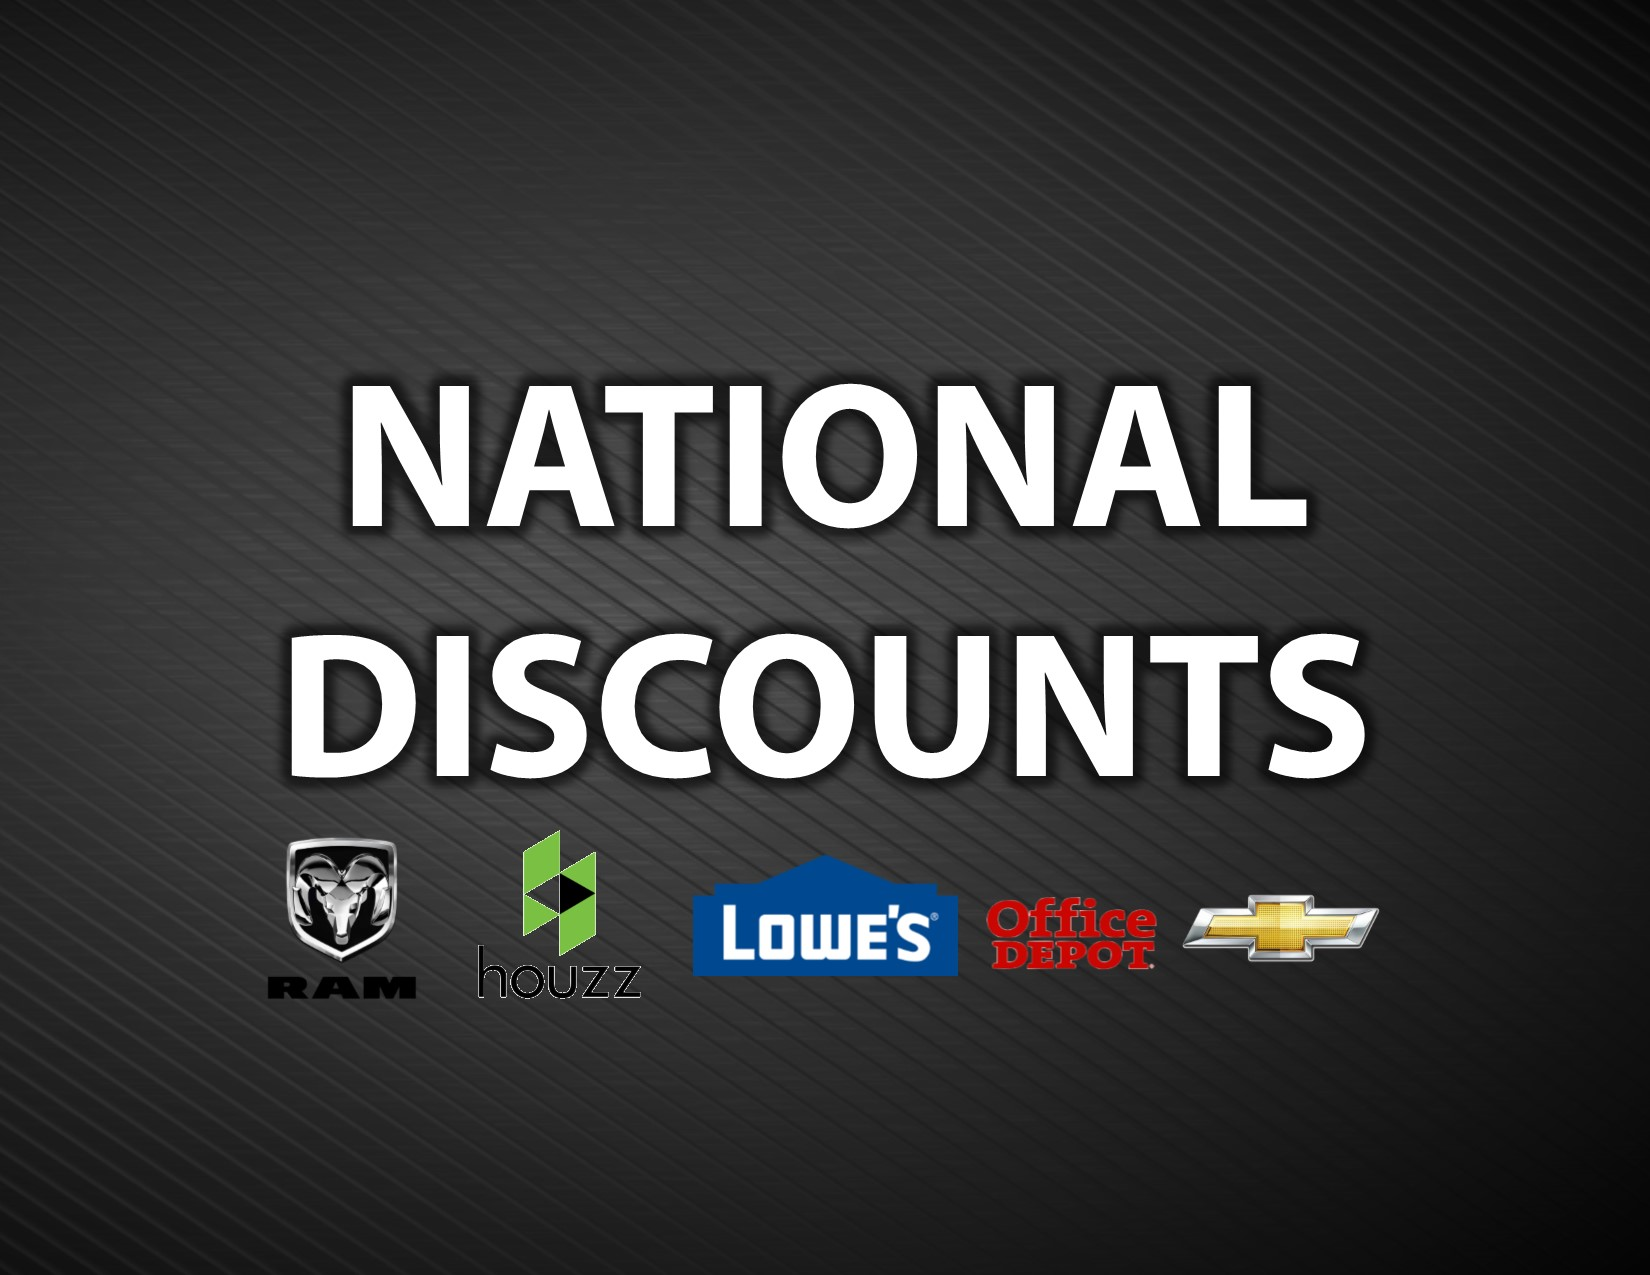 National-Discounts.jpg